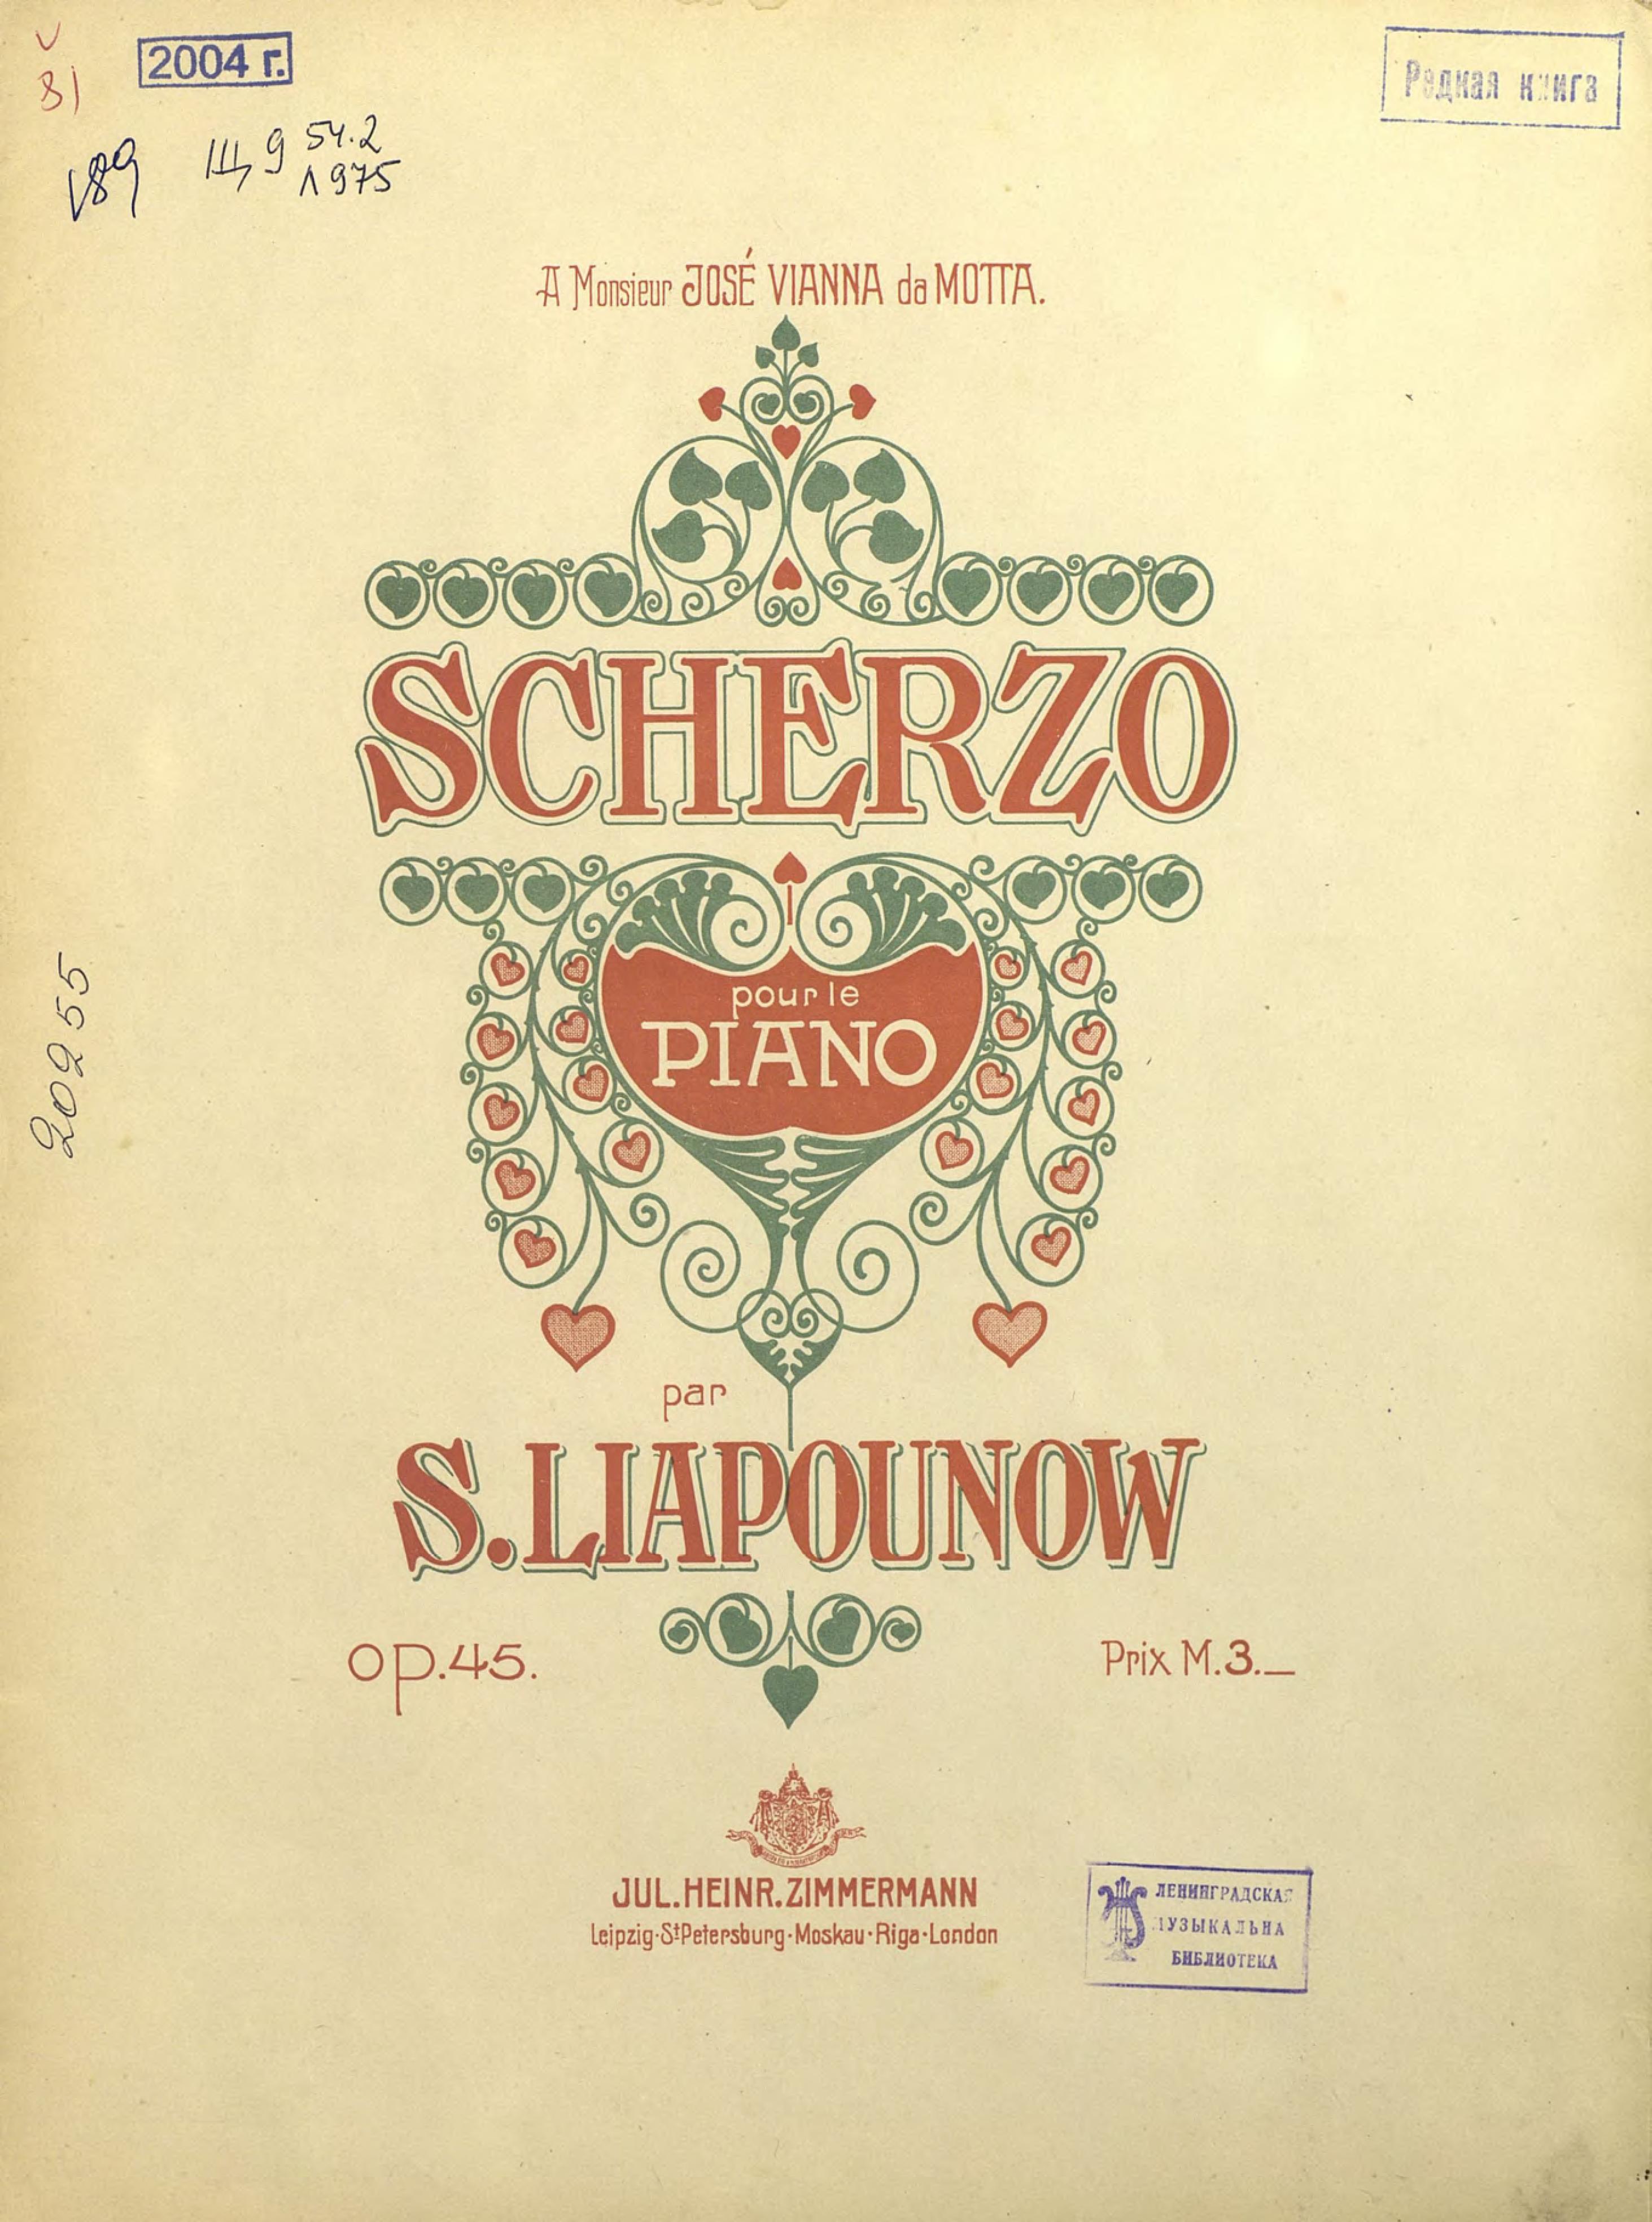 Сергей Михайлович Ляпунов Scherzo pour le piano par S. Liapunow цена